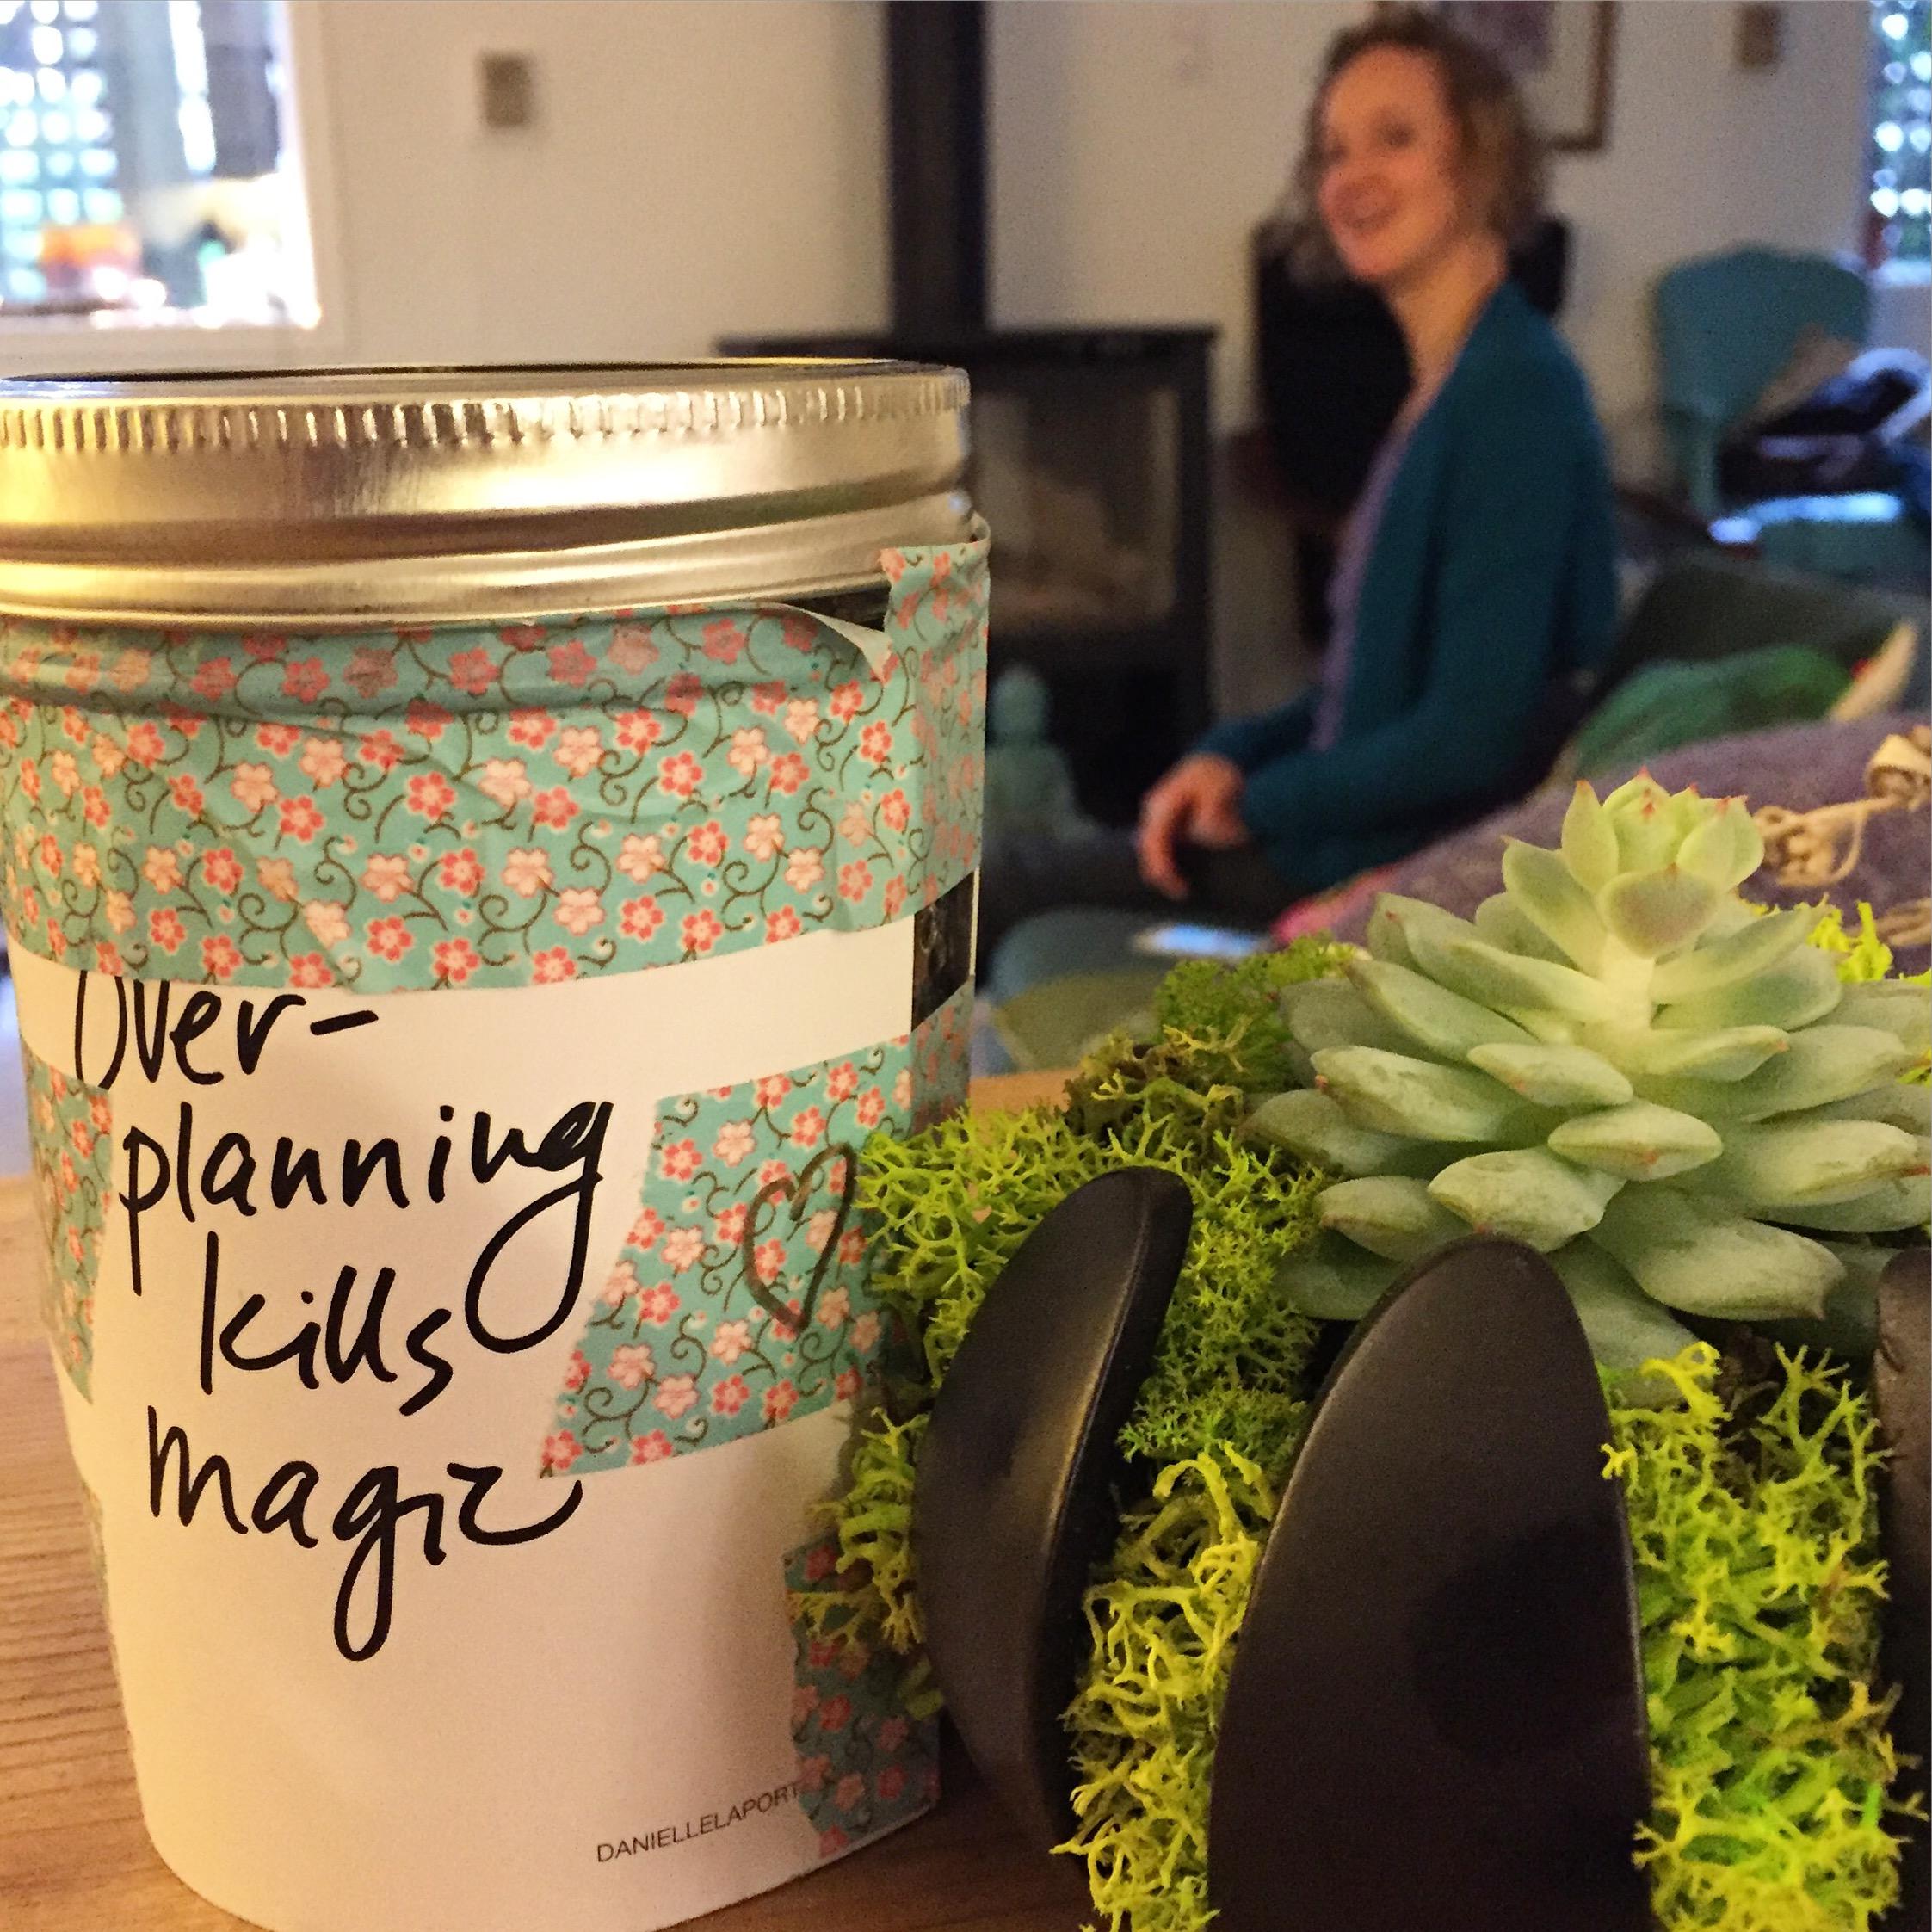 Overplanning kills the magic photo